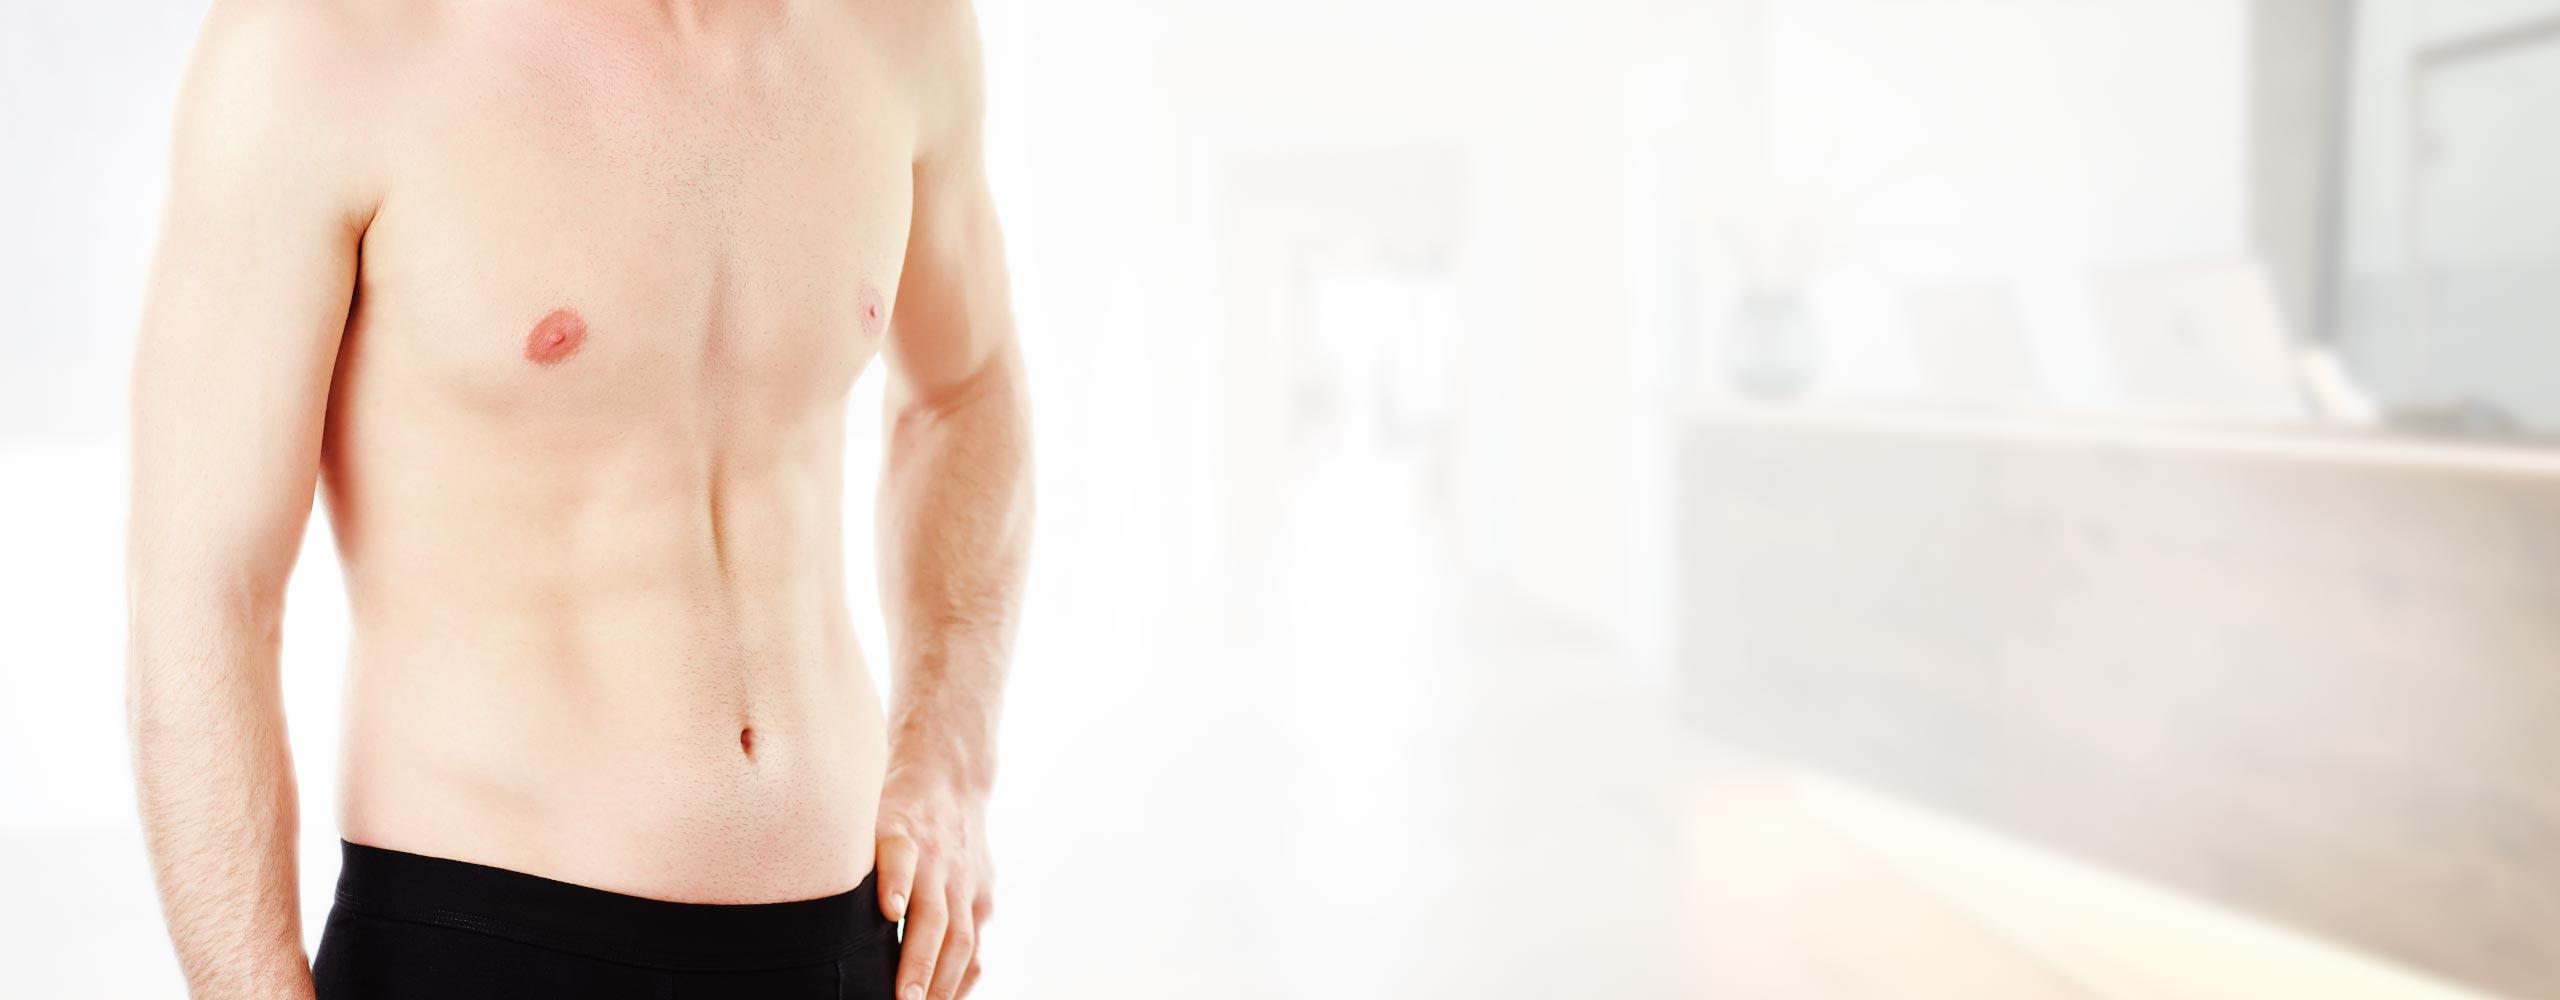 fettabsaugung mann liposuktion schoenheitsklinik proaesthetic header